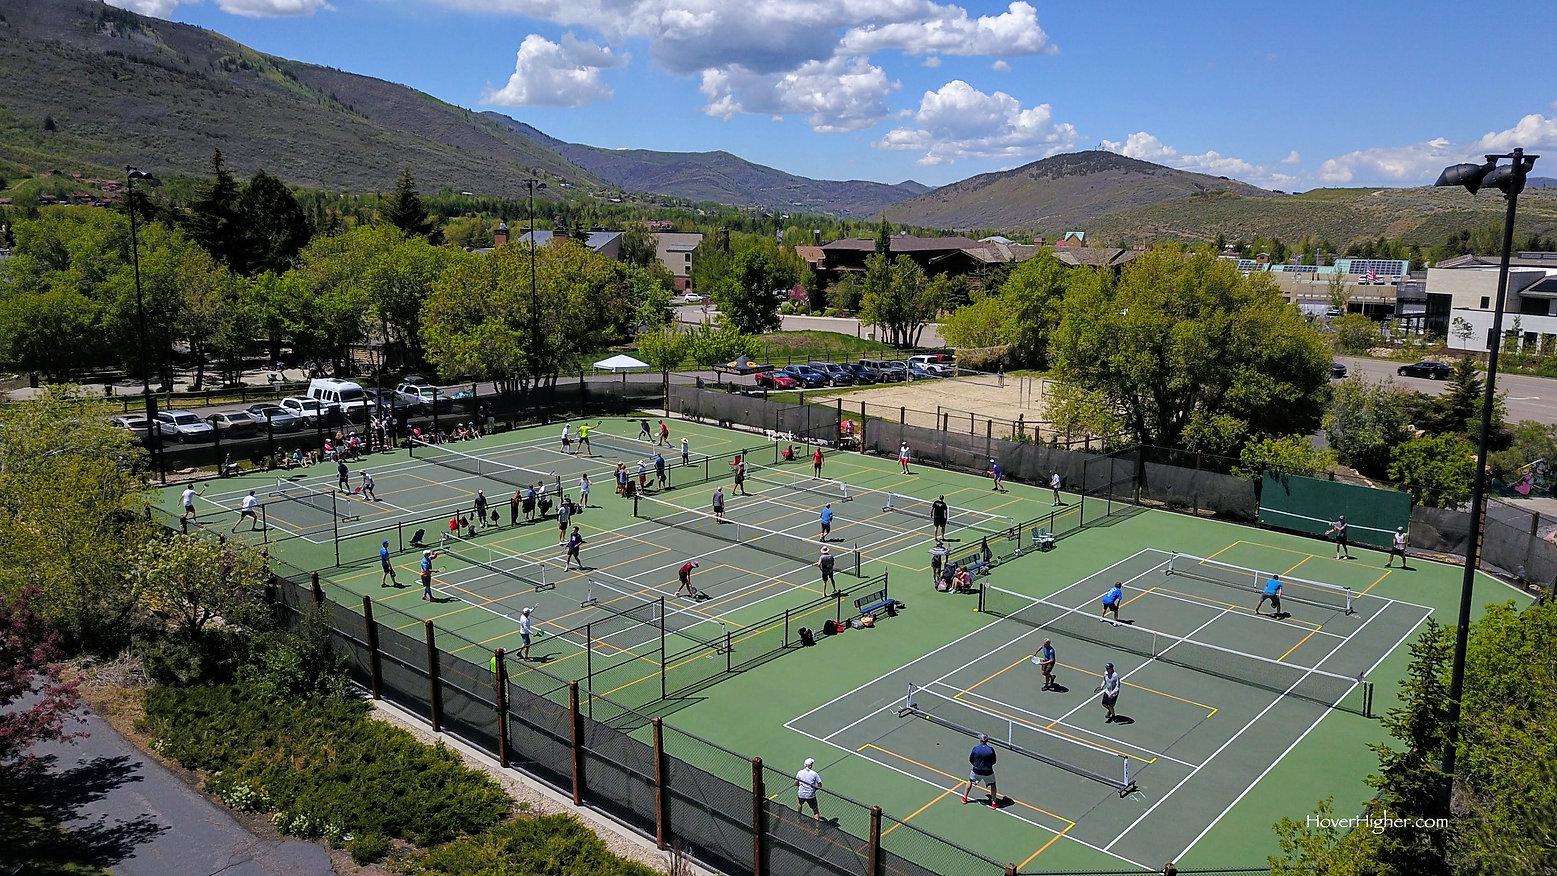 City Park Courts Memorial Day Tournament